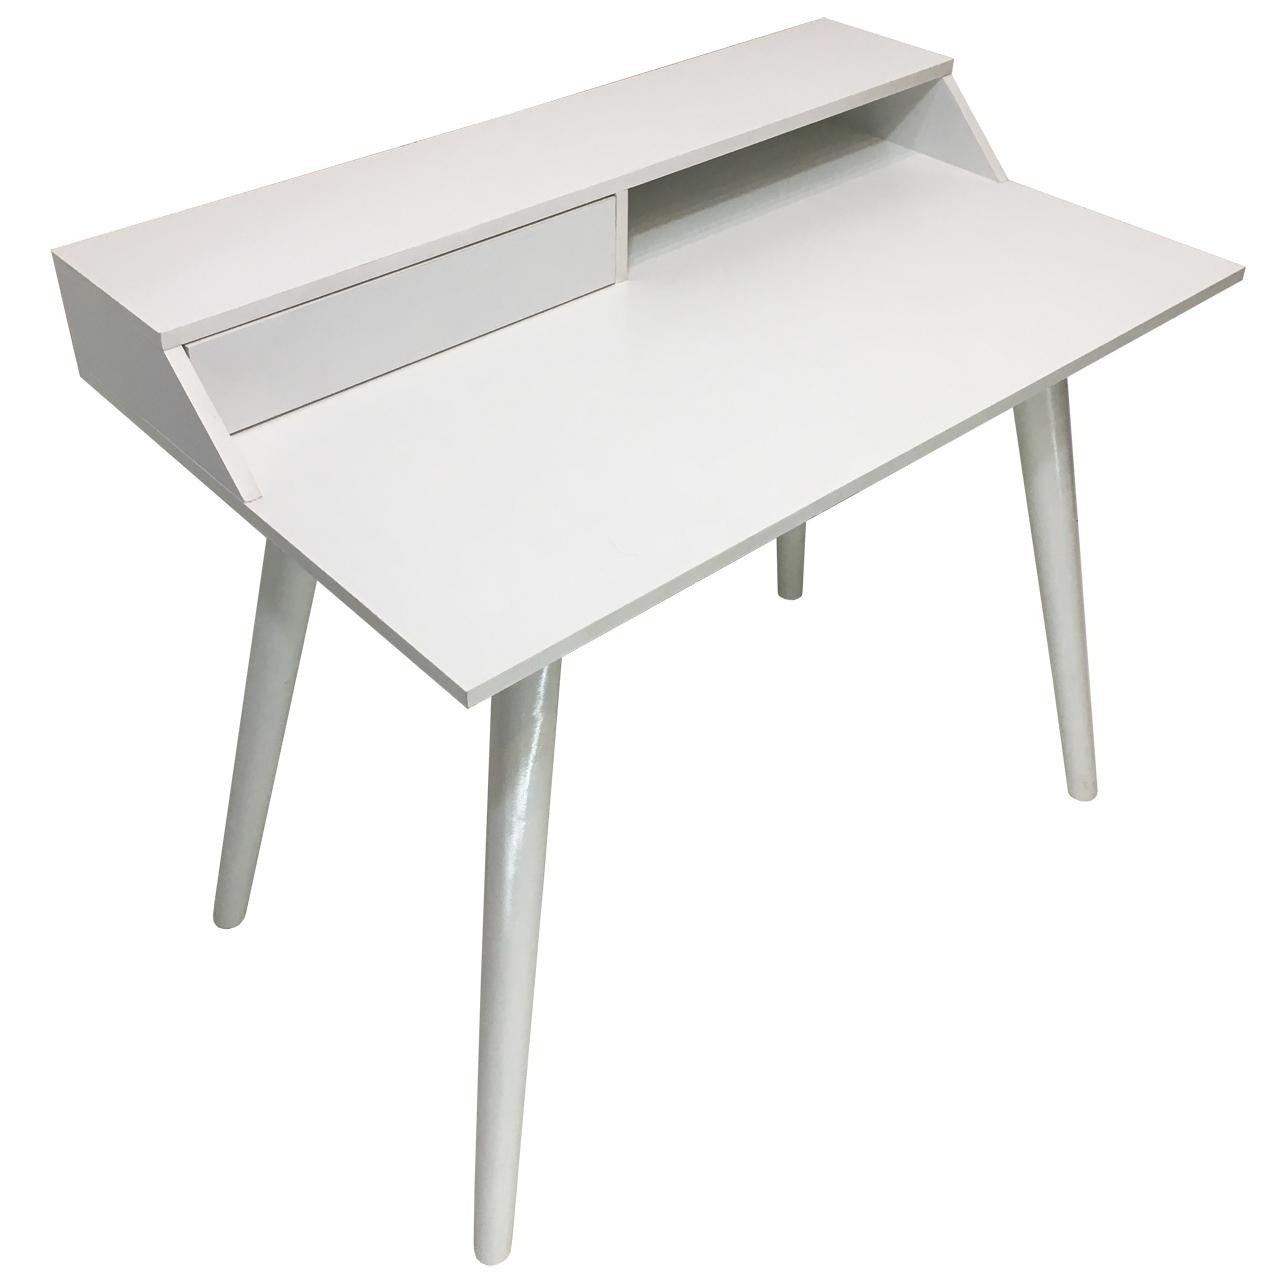 میز تحریر مدل 3100